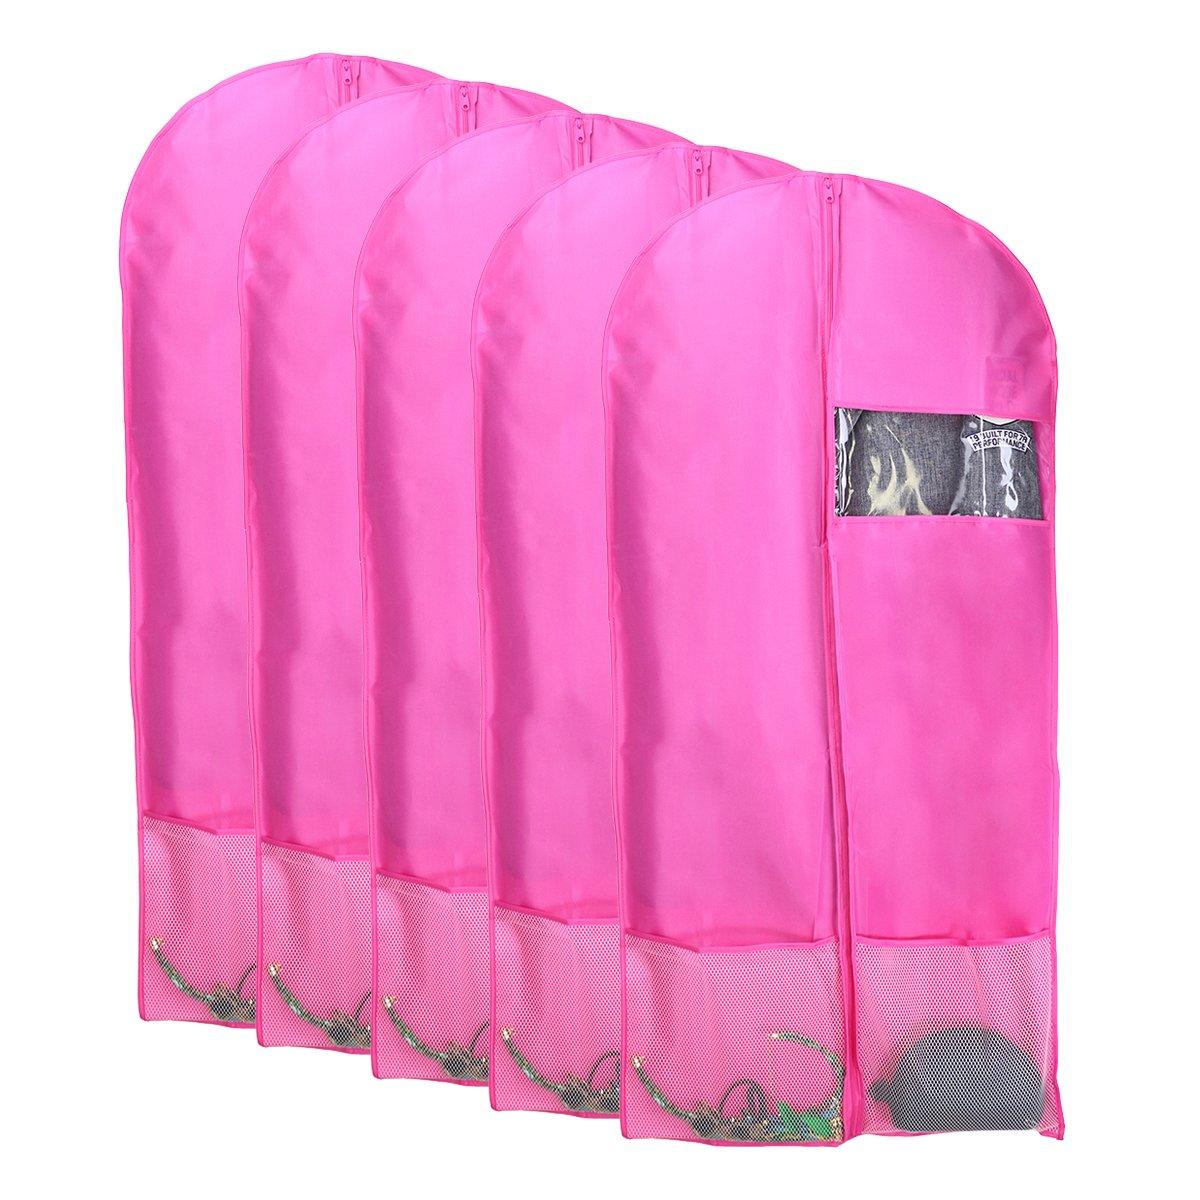 438ab4cd7dec Details about Kernorv Garment Bags for Dance Costumes, Set of 5 Breathable  Dust-proof Garment